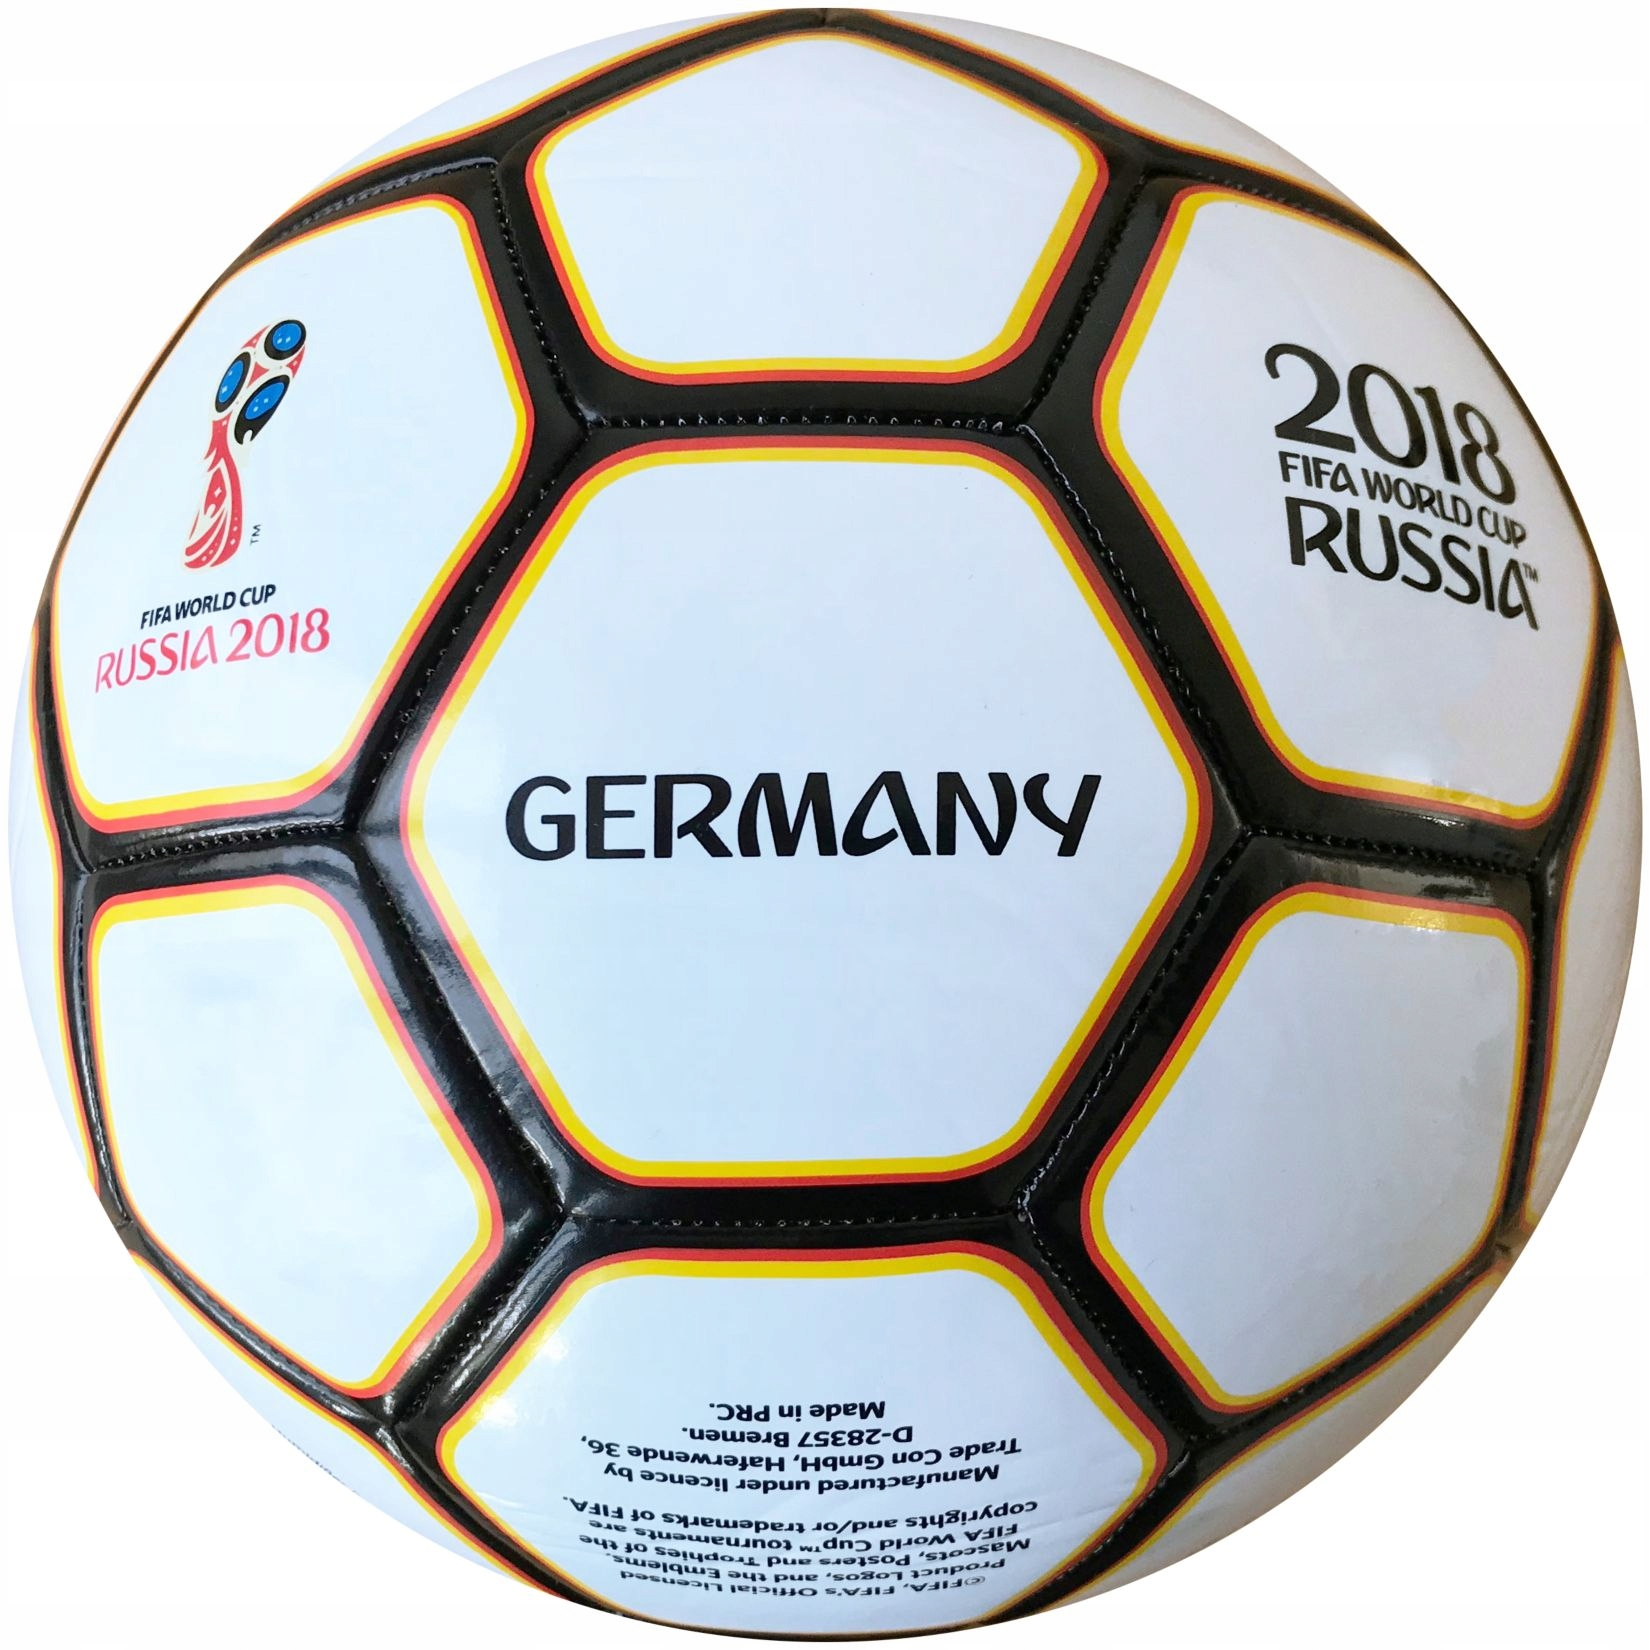 Piłka FIFA WORLD CUP 2018 ROSSIA GERMANY